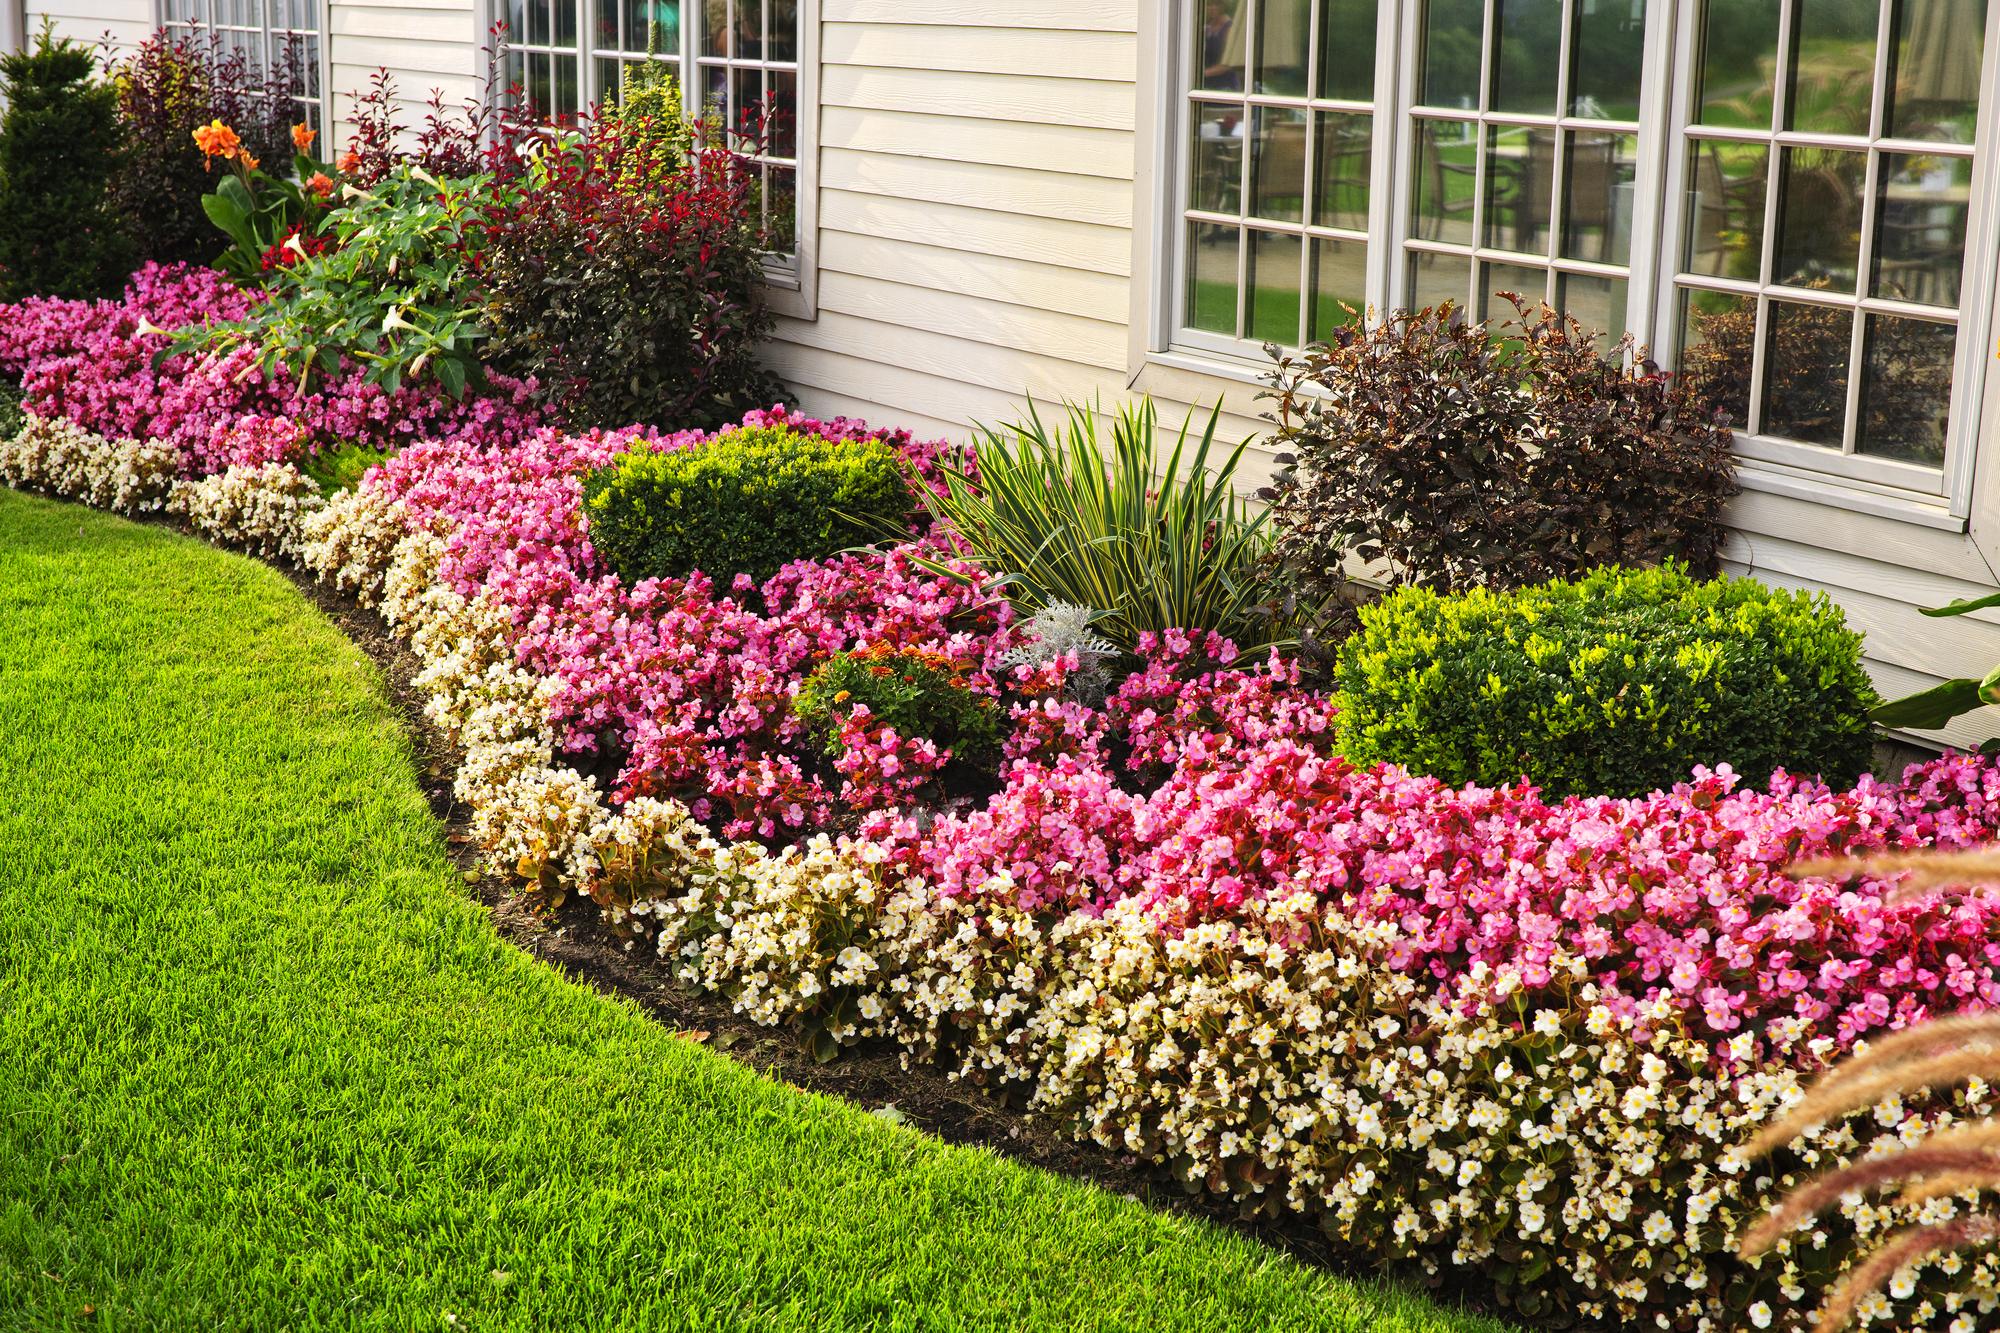 Glancing Choose Among Landscaping Ideas Consider Planting Perennials That Will Return Eachyear You Can A Backyard Barnhardt outdoor Beautiful Backyard Landscaping Ideas